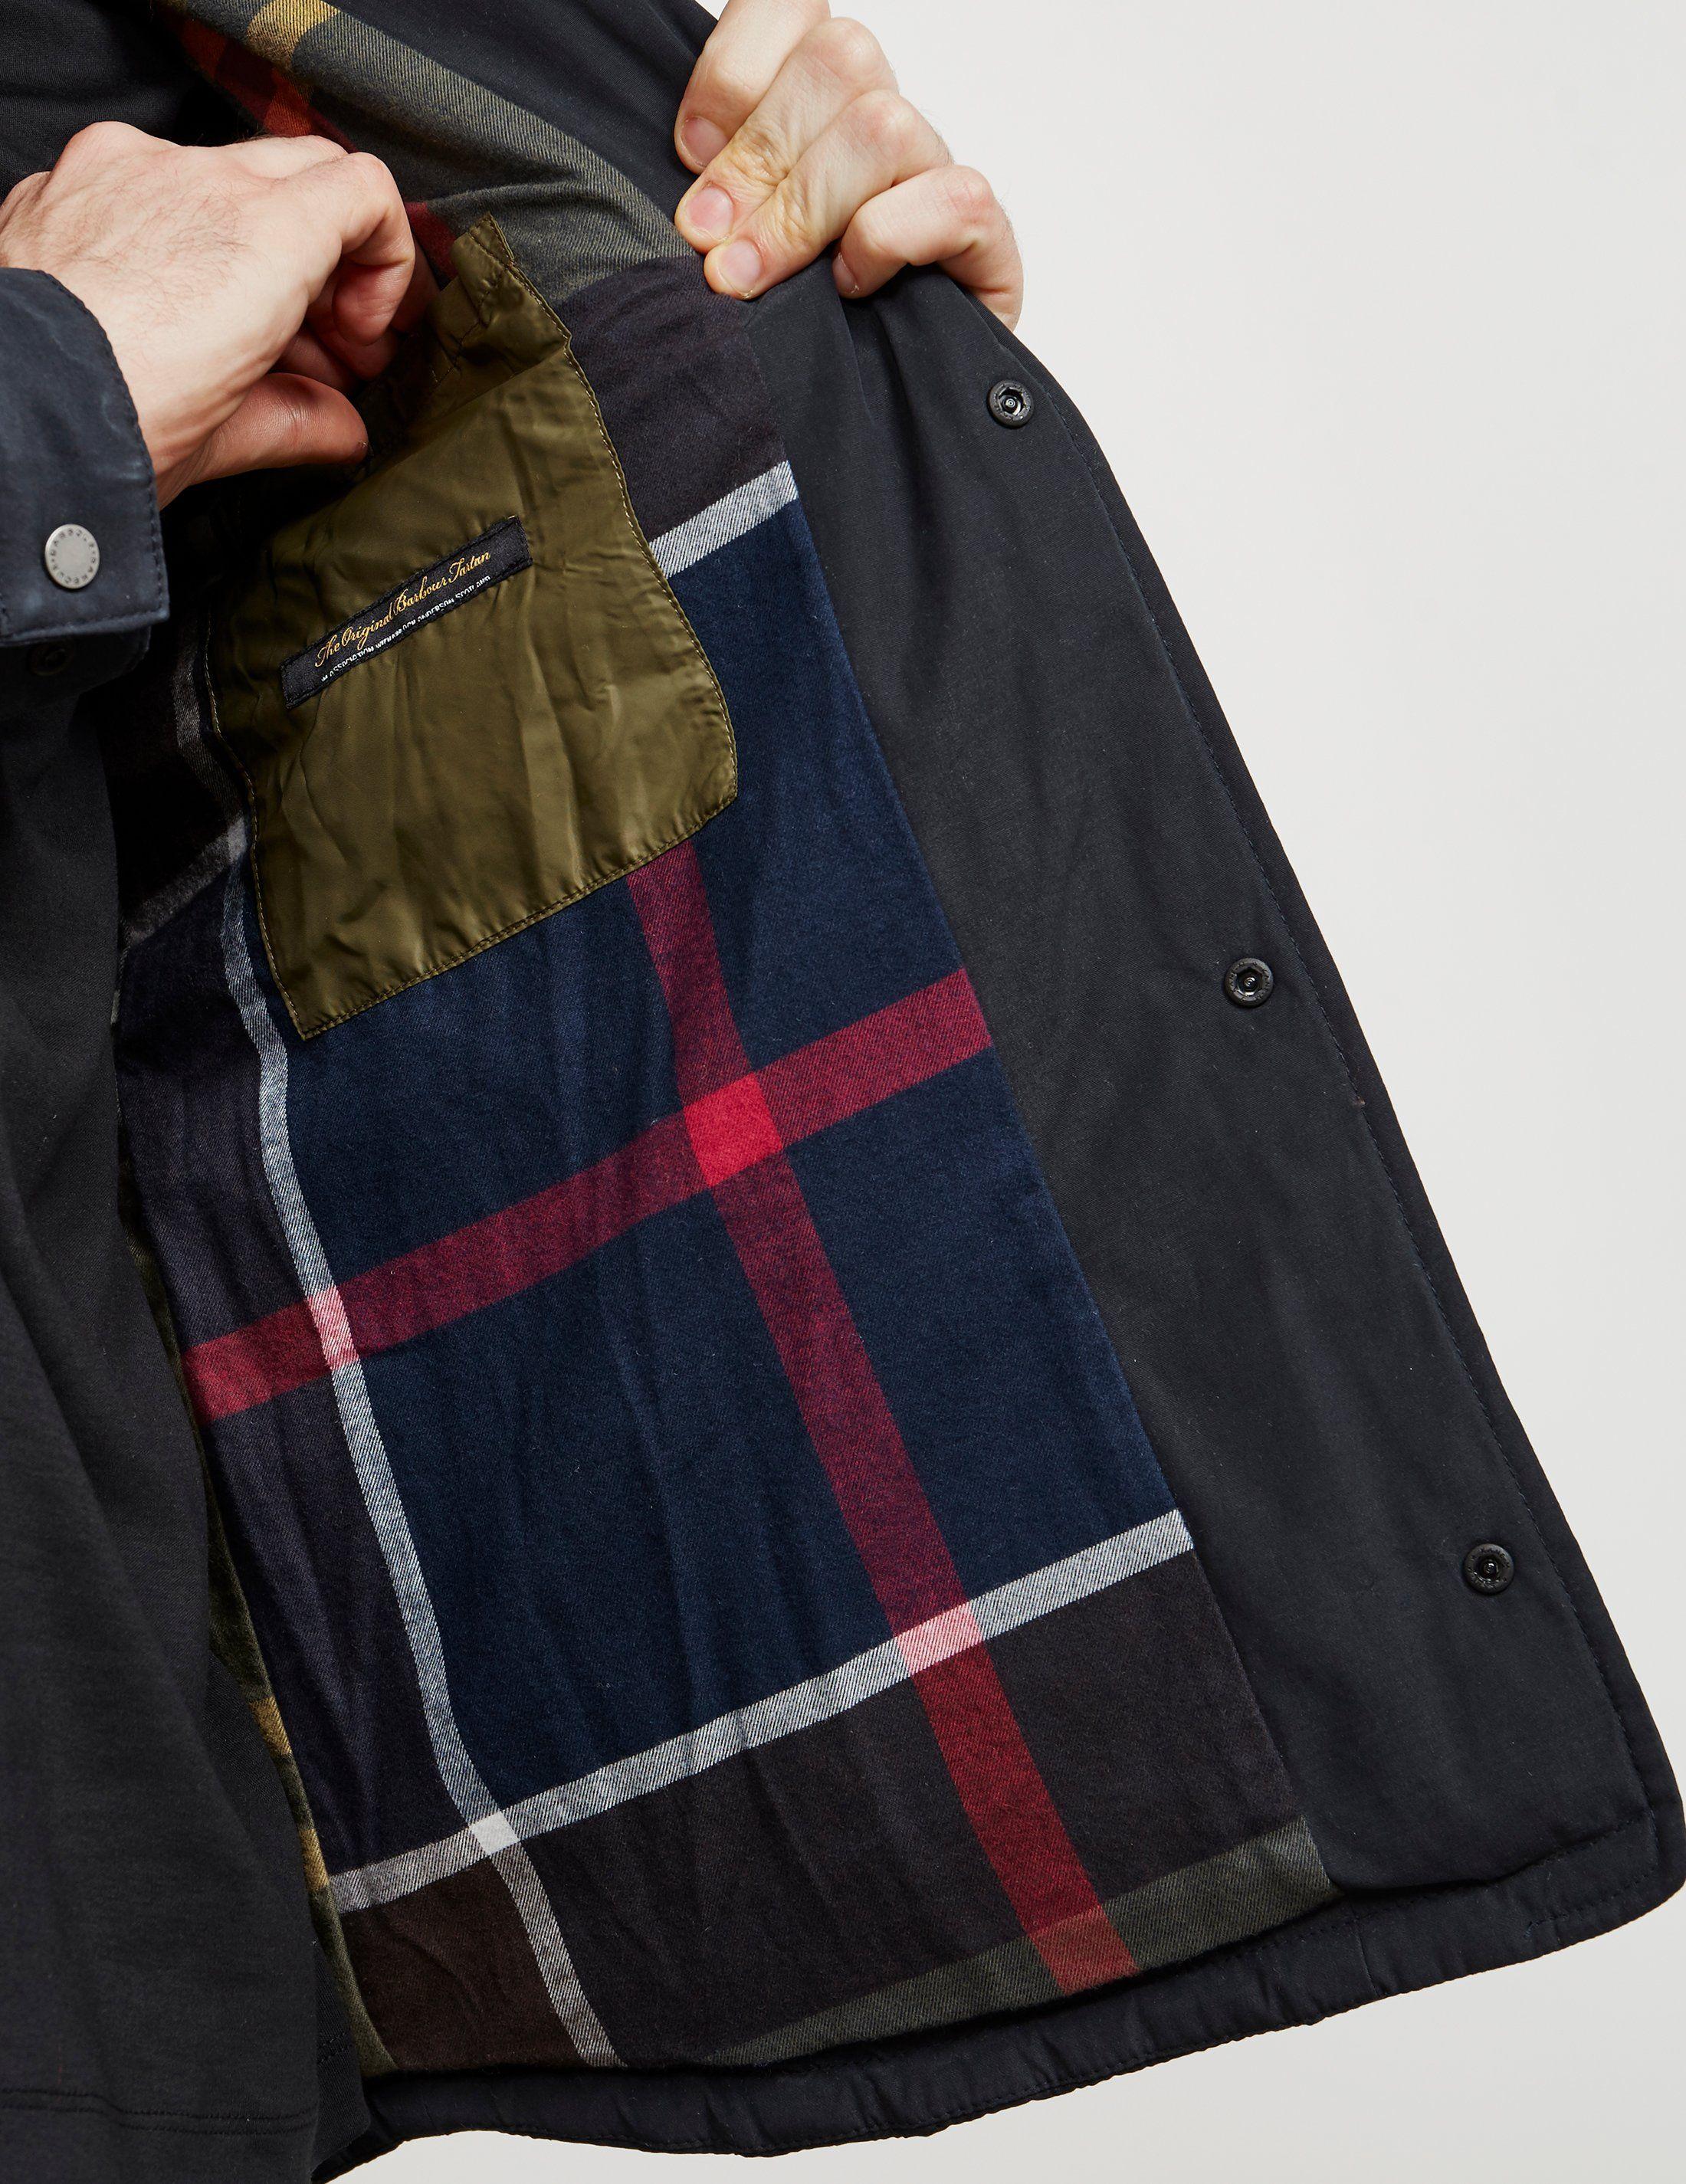 Barbour Elm Lightweight Quilted Jacket - Online Exclusive